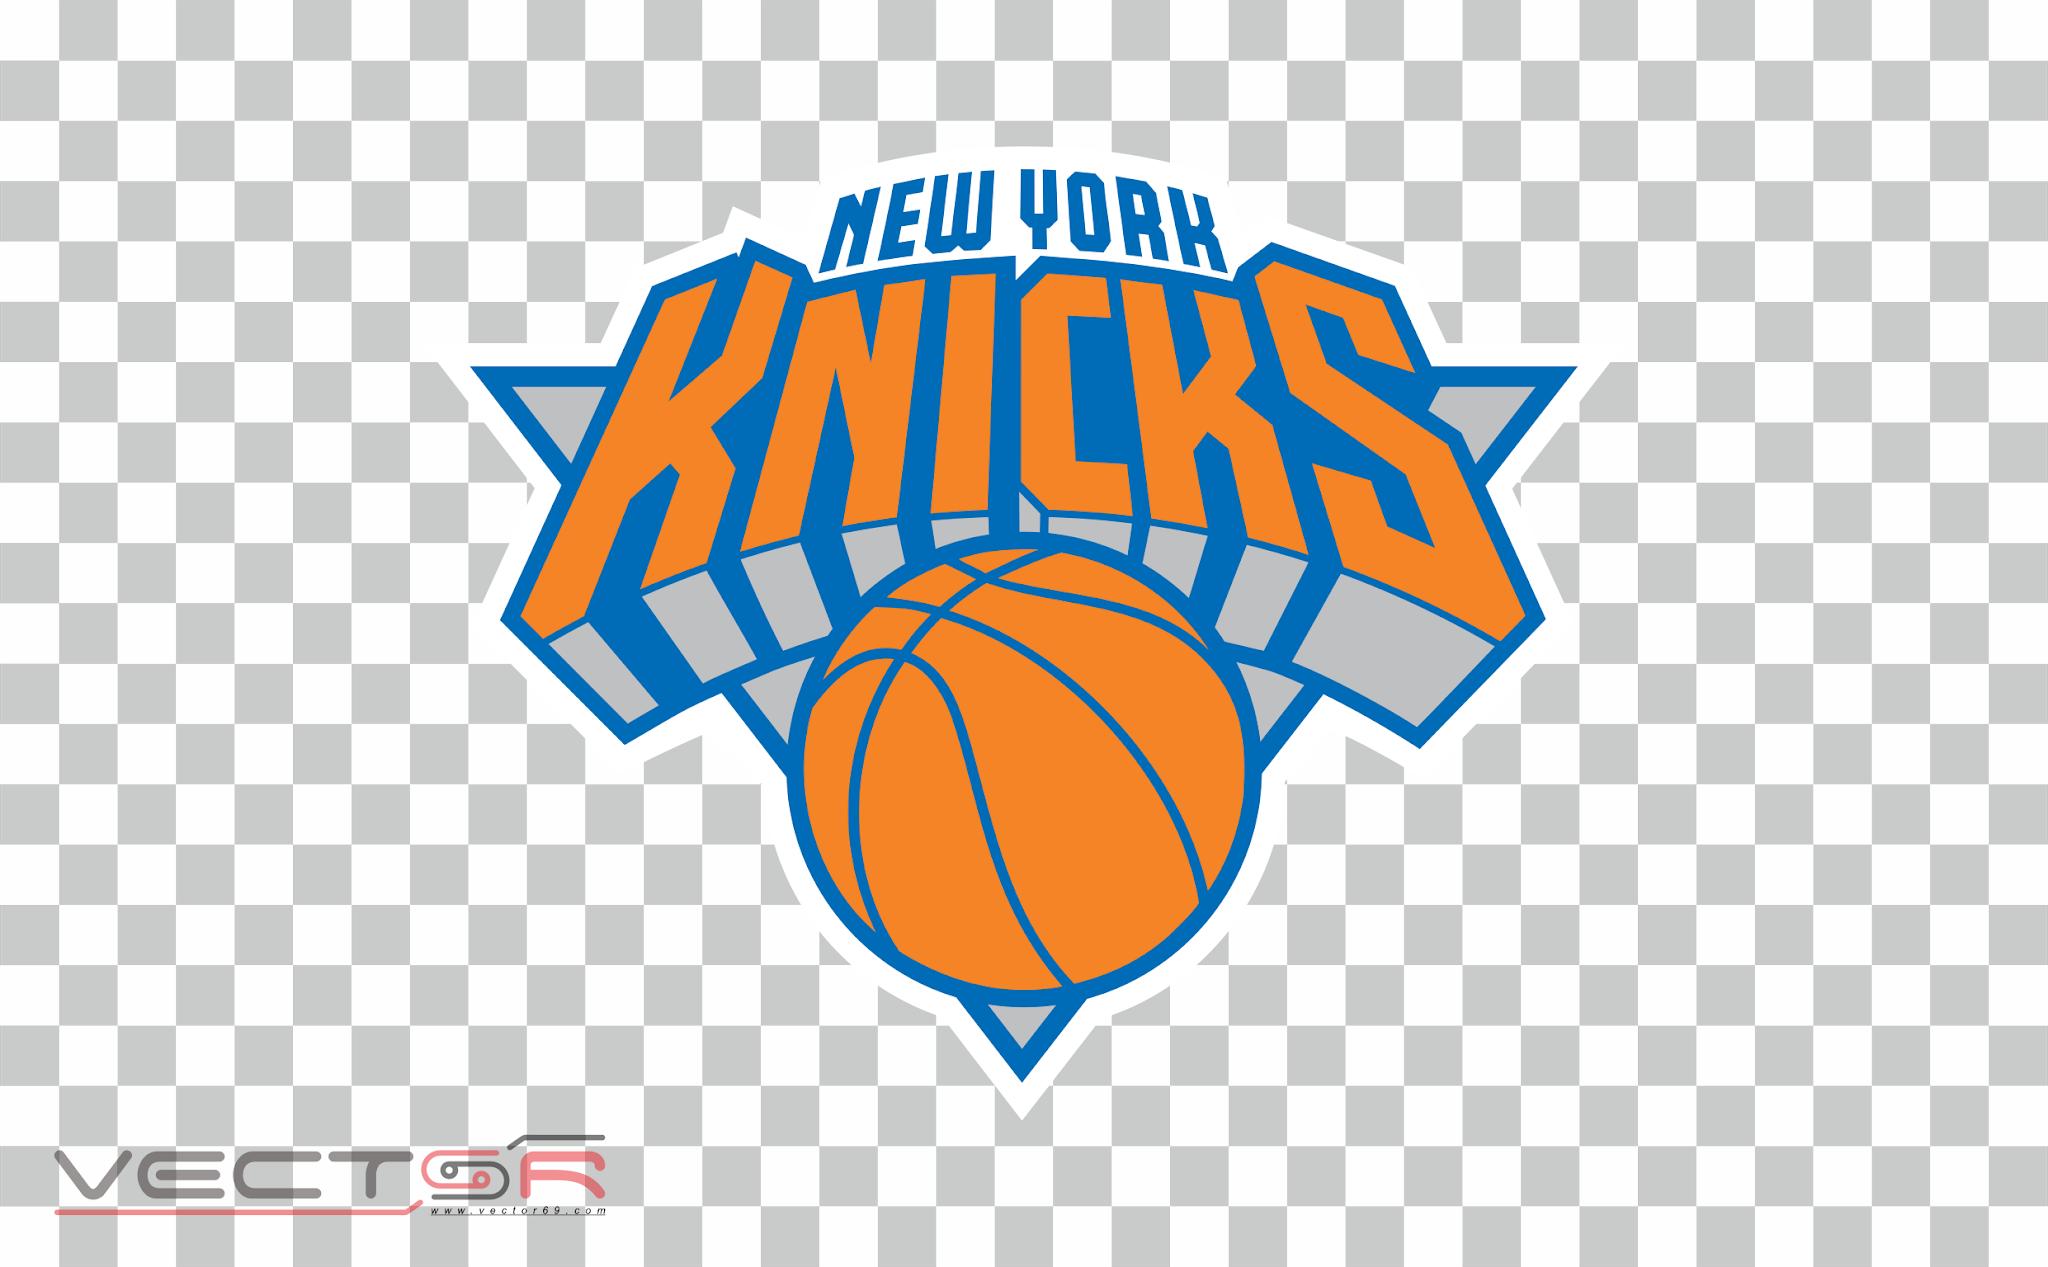 New York Knicks Logo - Download .PNG (Portable Network Graphics) Transparent Images